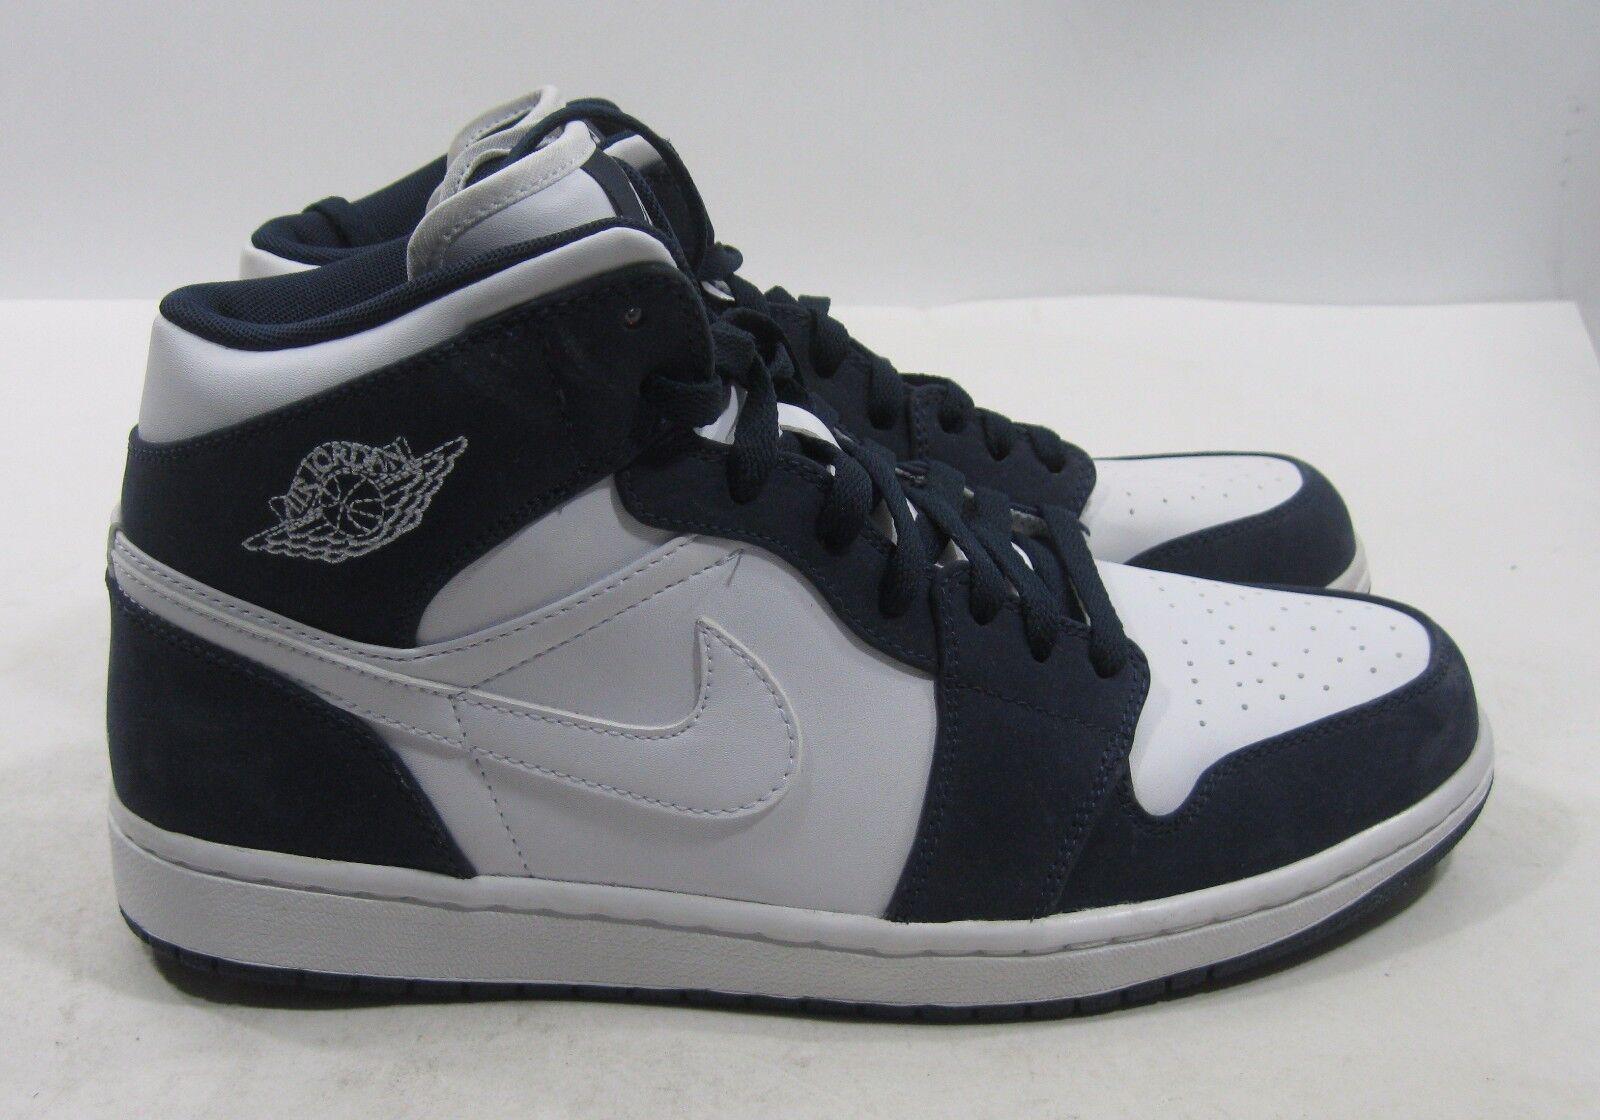 Nike Air Jordan Retro 1 hat White/White-Obsidian 364770-104 Size 11.5